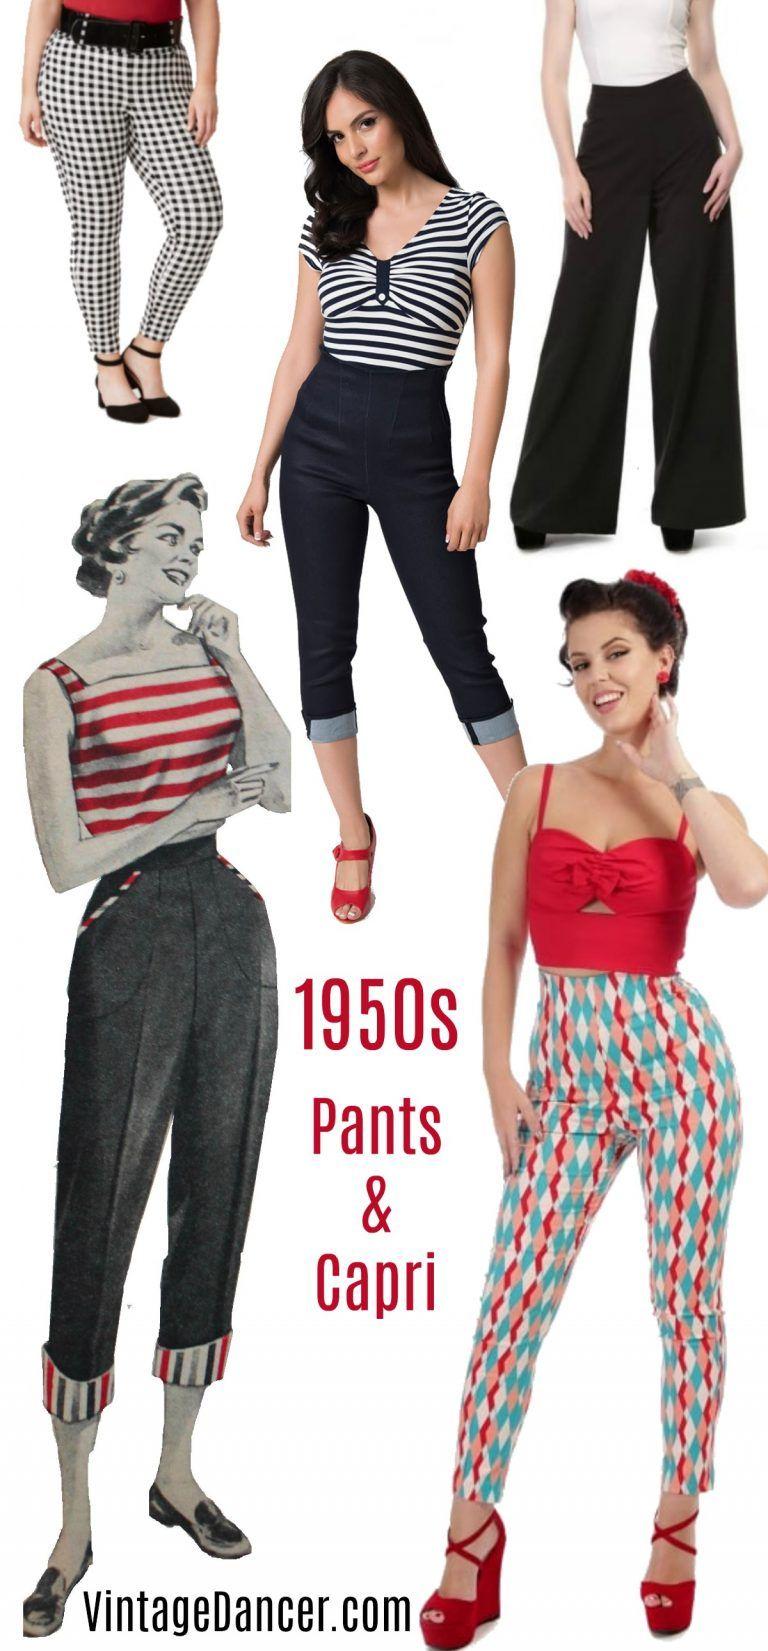 3da4a9aa6e7f 1950s pin up high waist pants and capri bottoms, 50s trousers